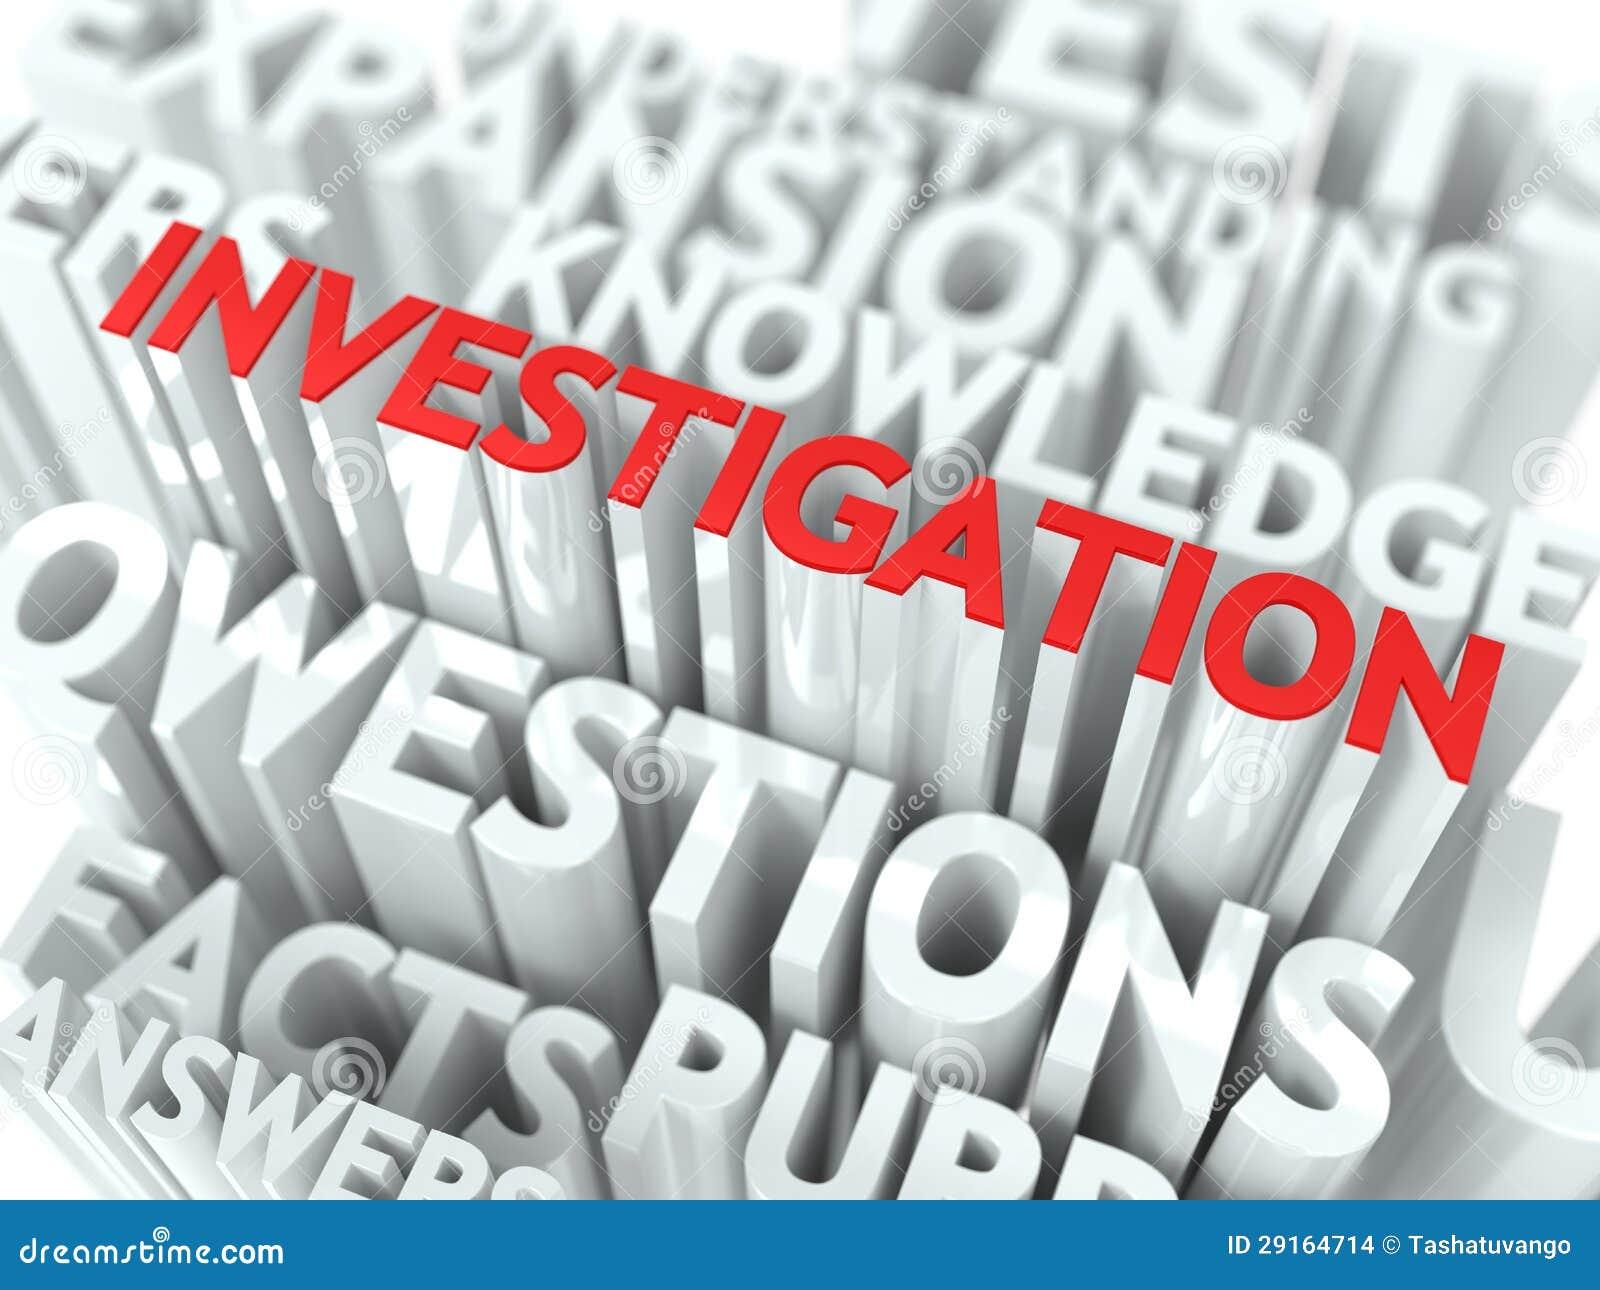 investigation-concept-29164714.jpg